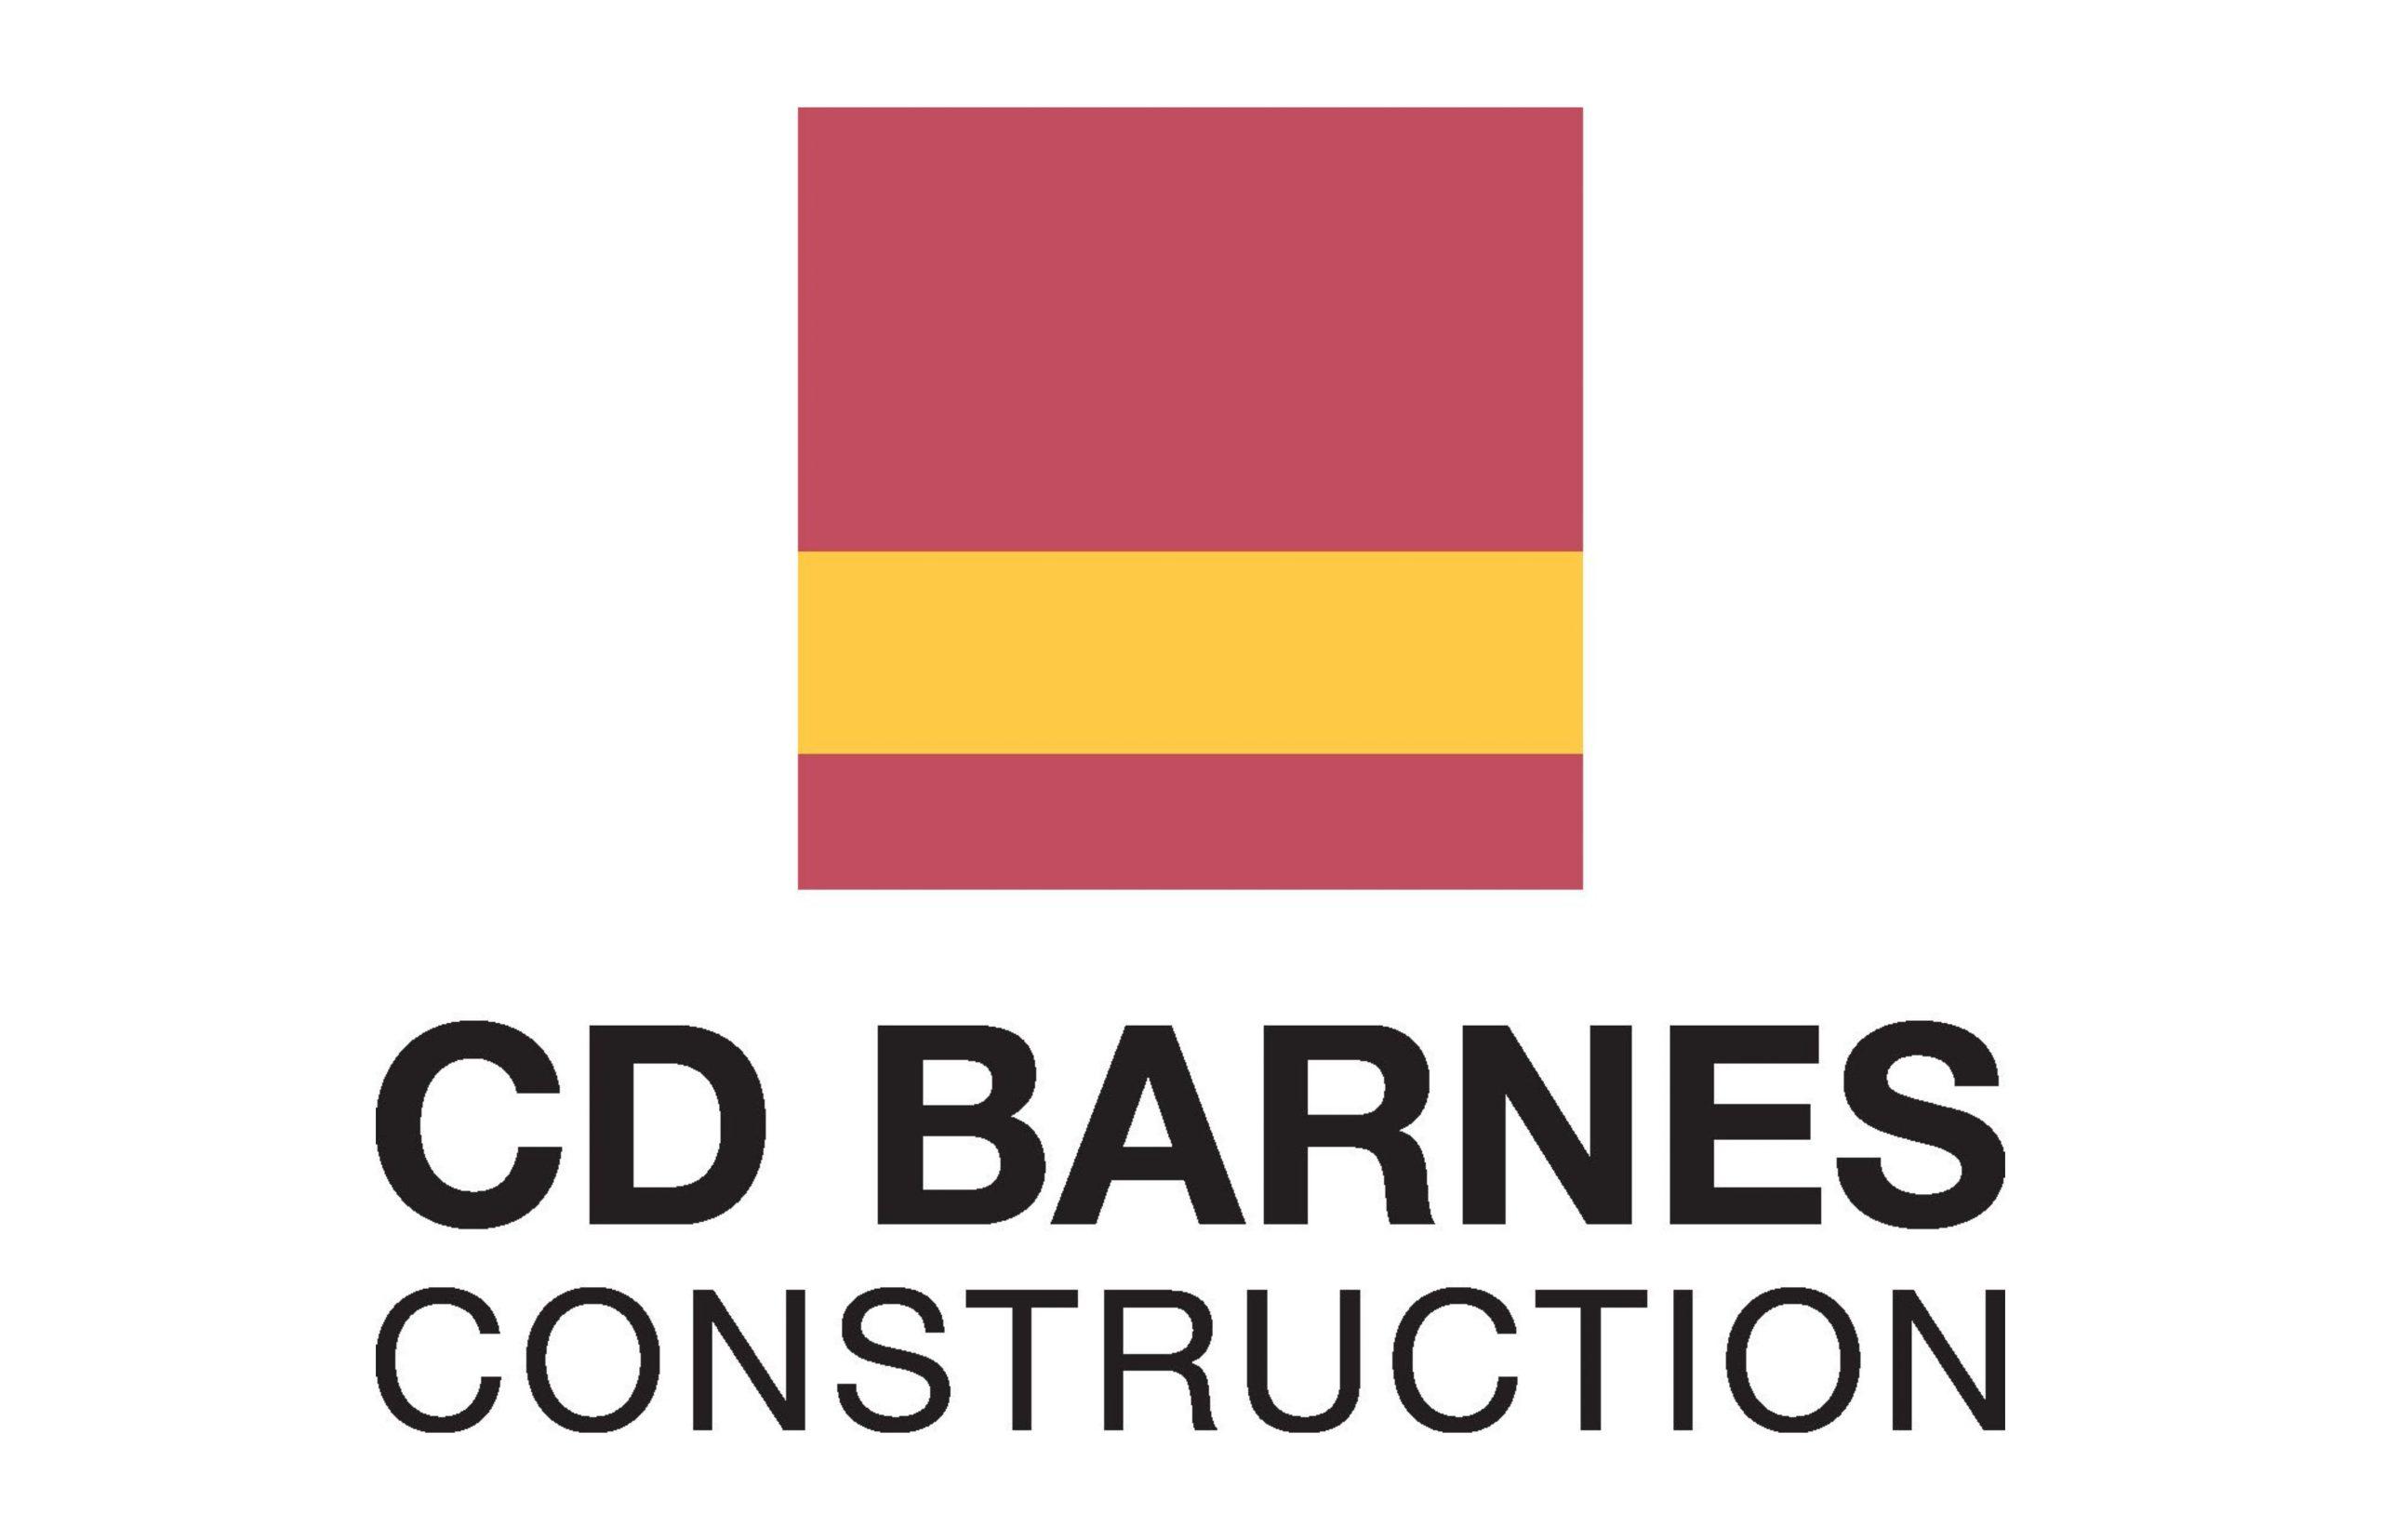 CD Barnes